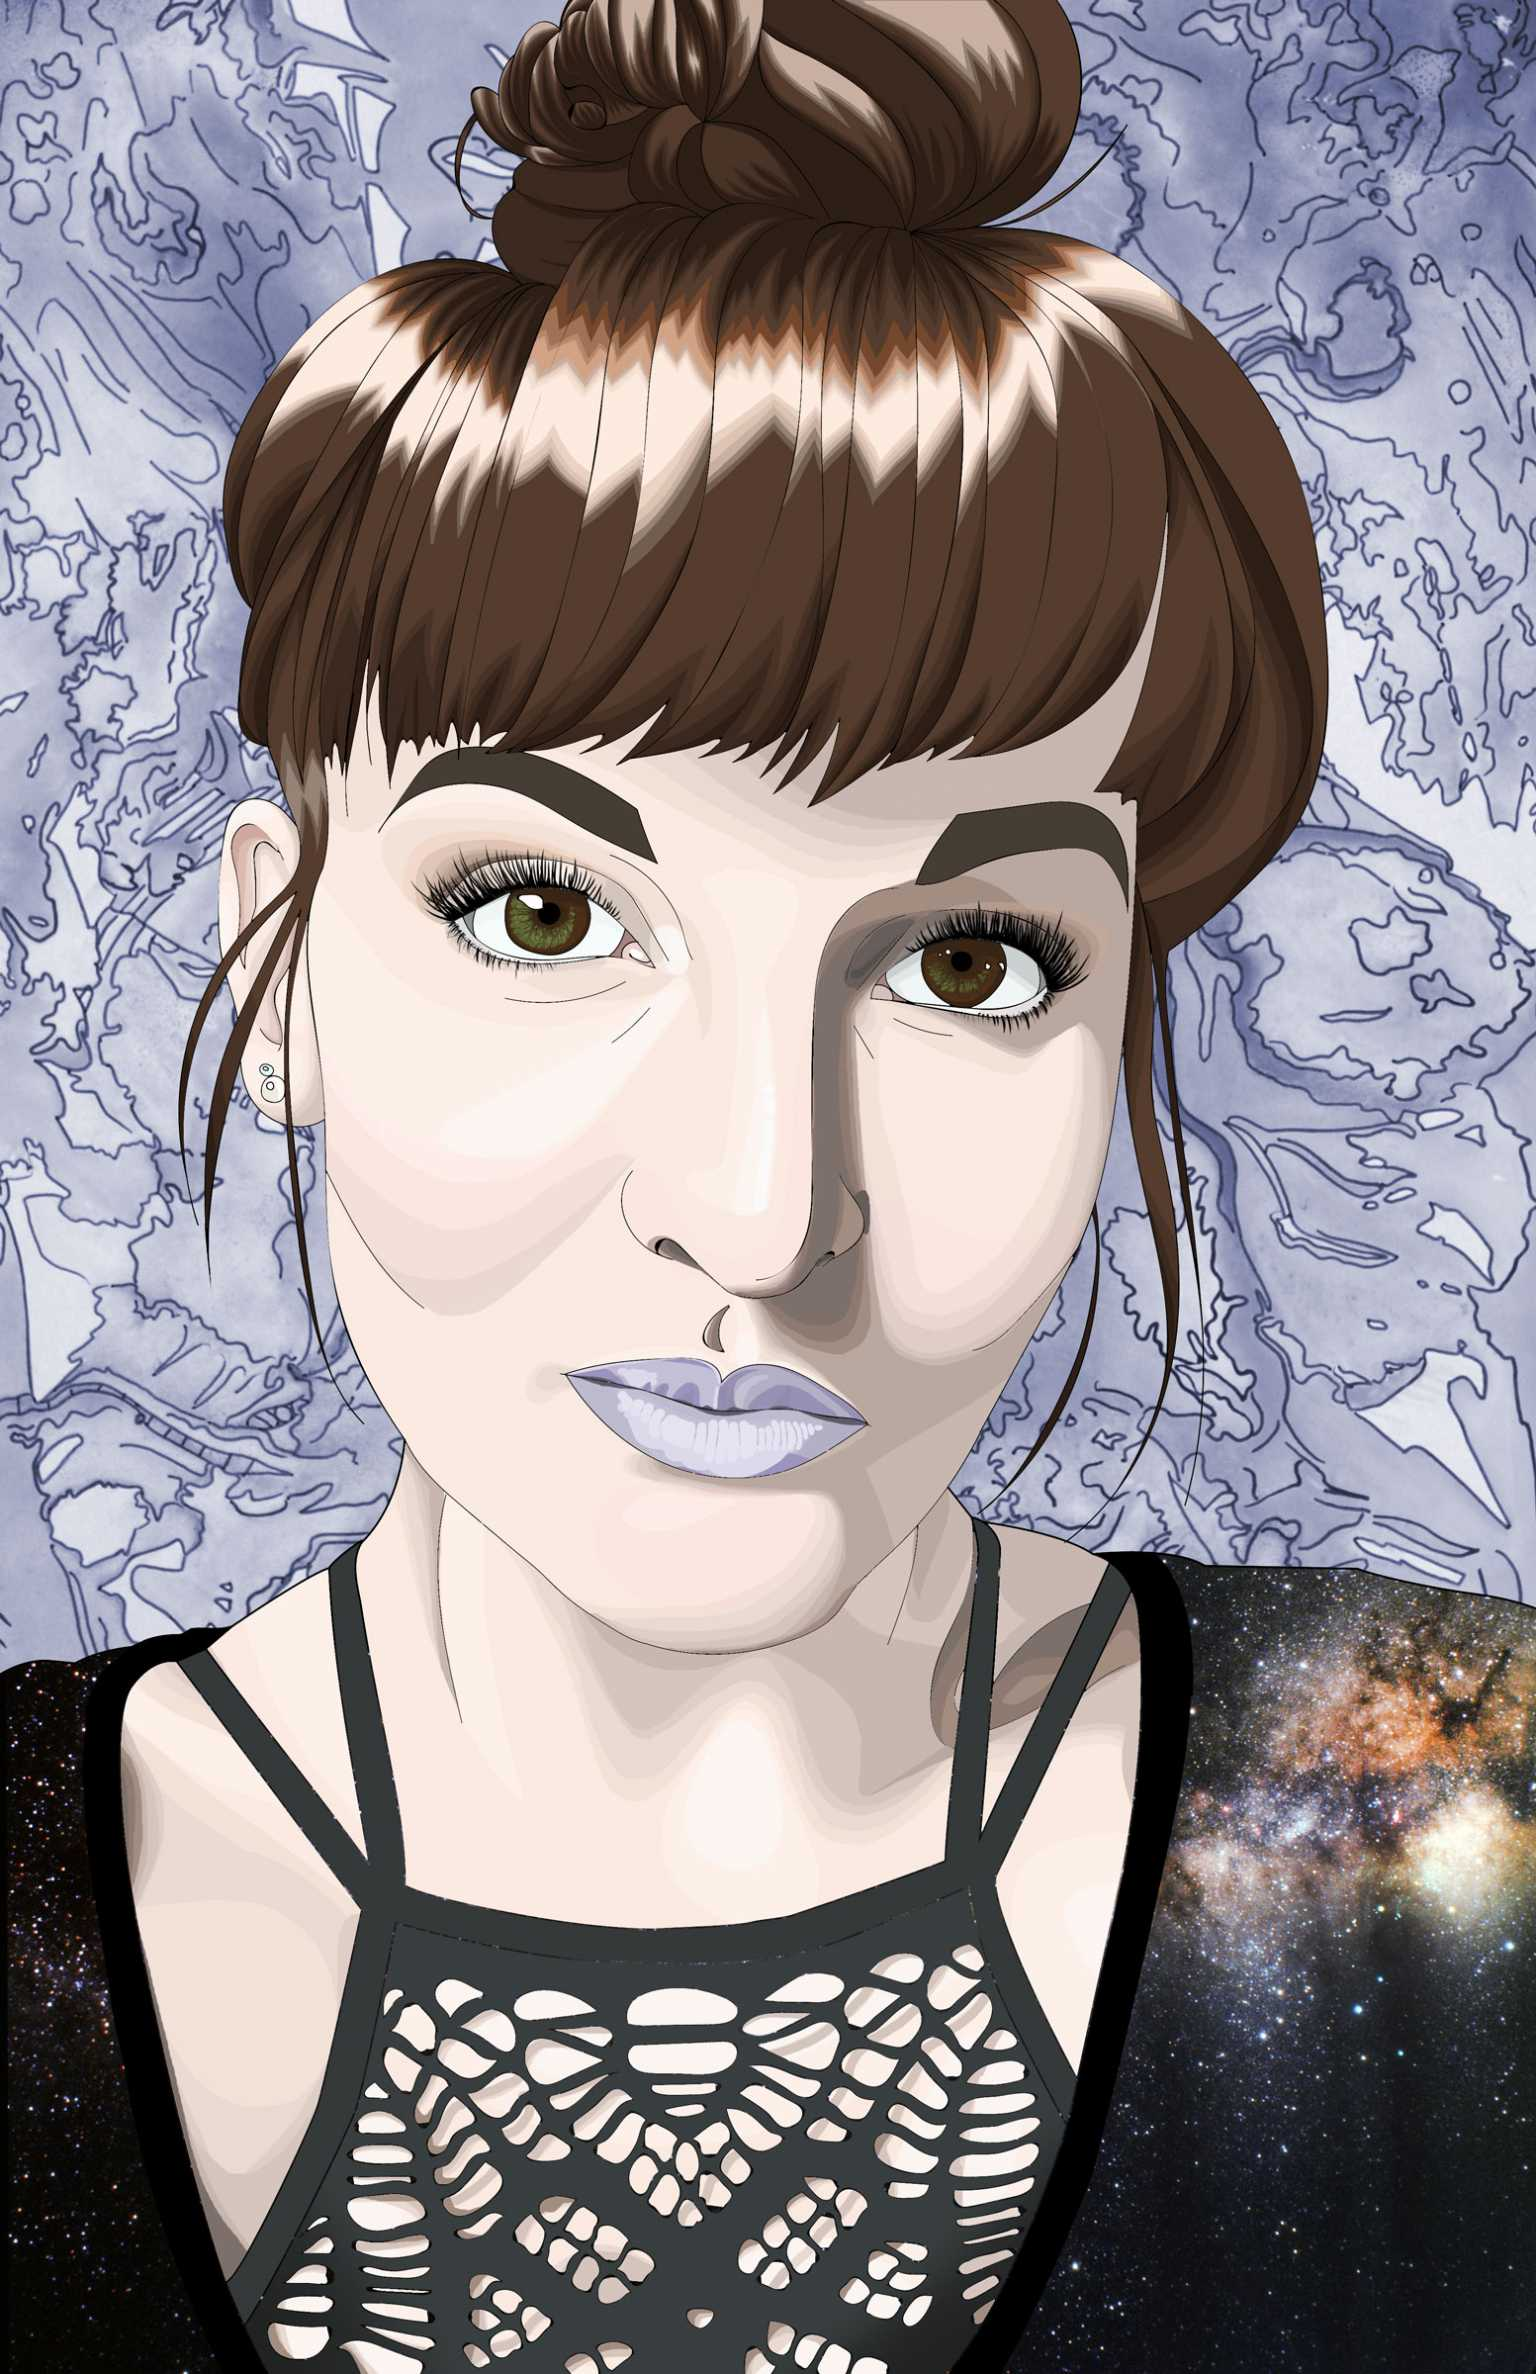 Self portrait from Digital Imaging class